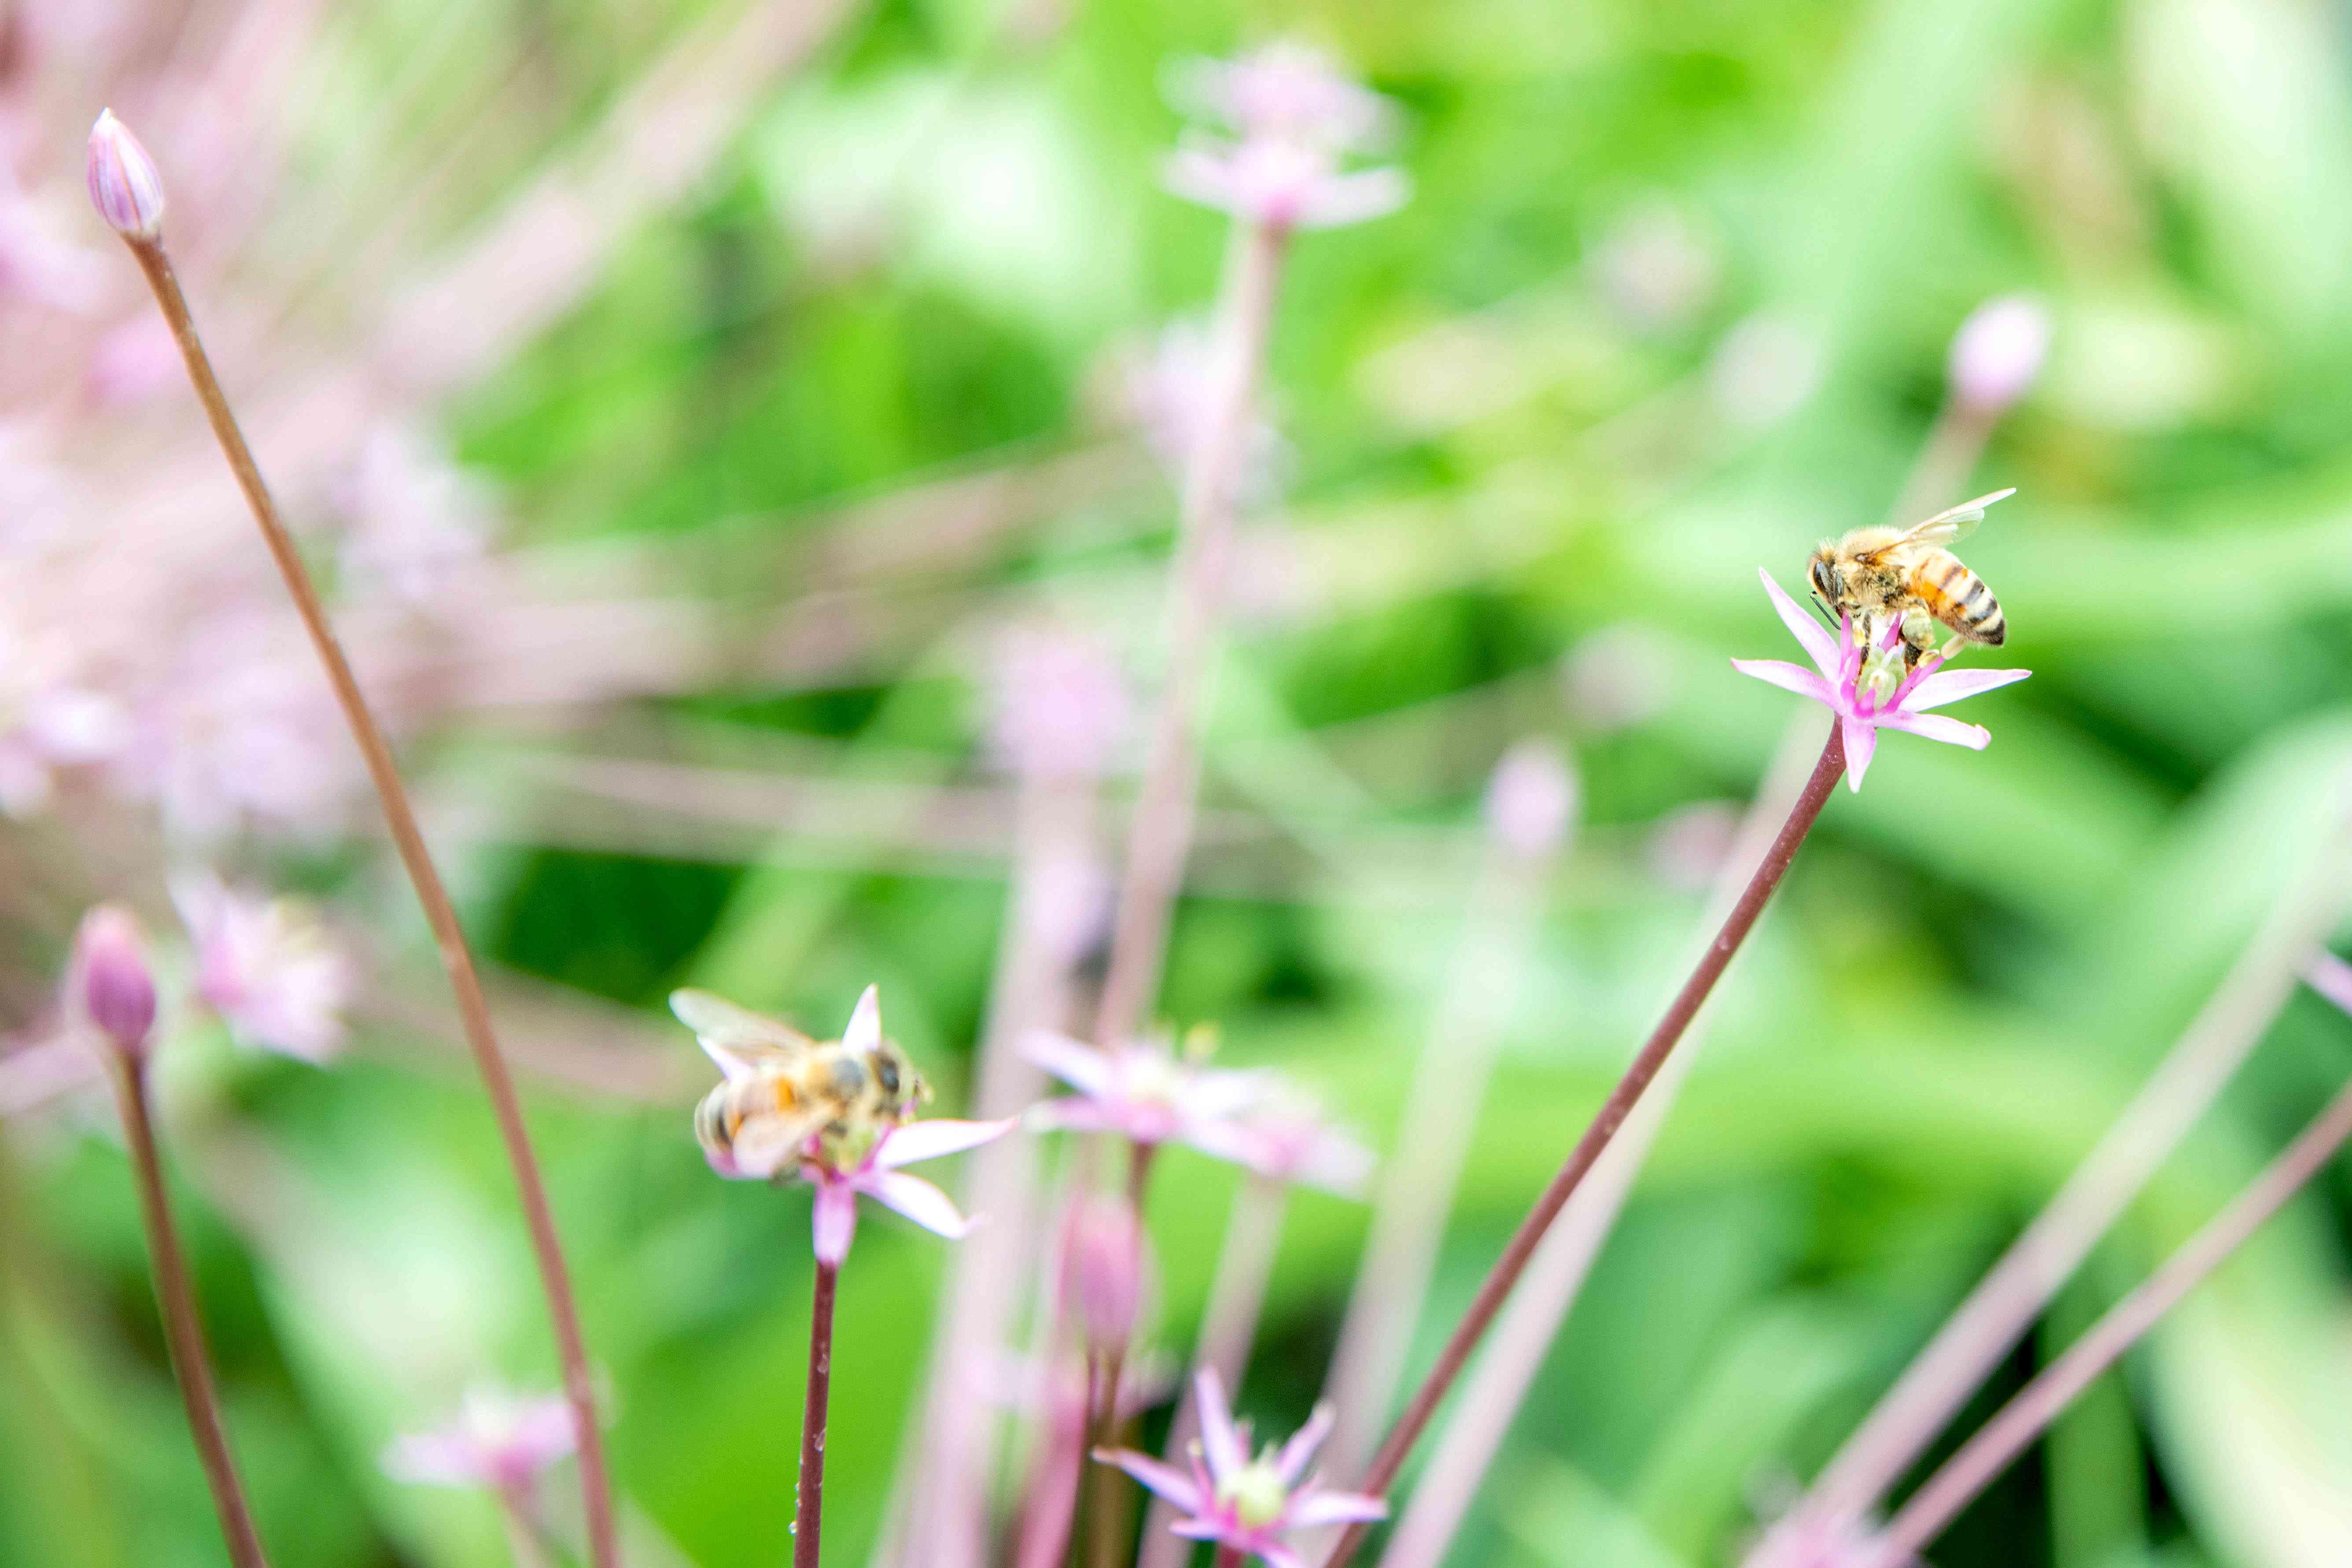 Schubert's allium tiny star-shaped flowers extending from clusters closeup